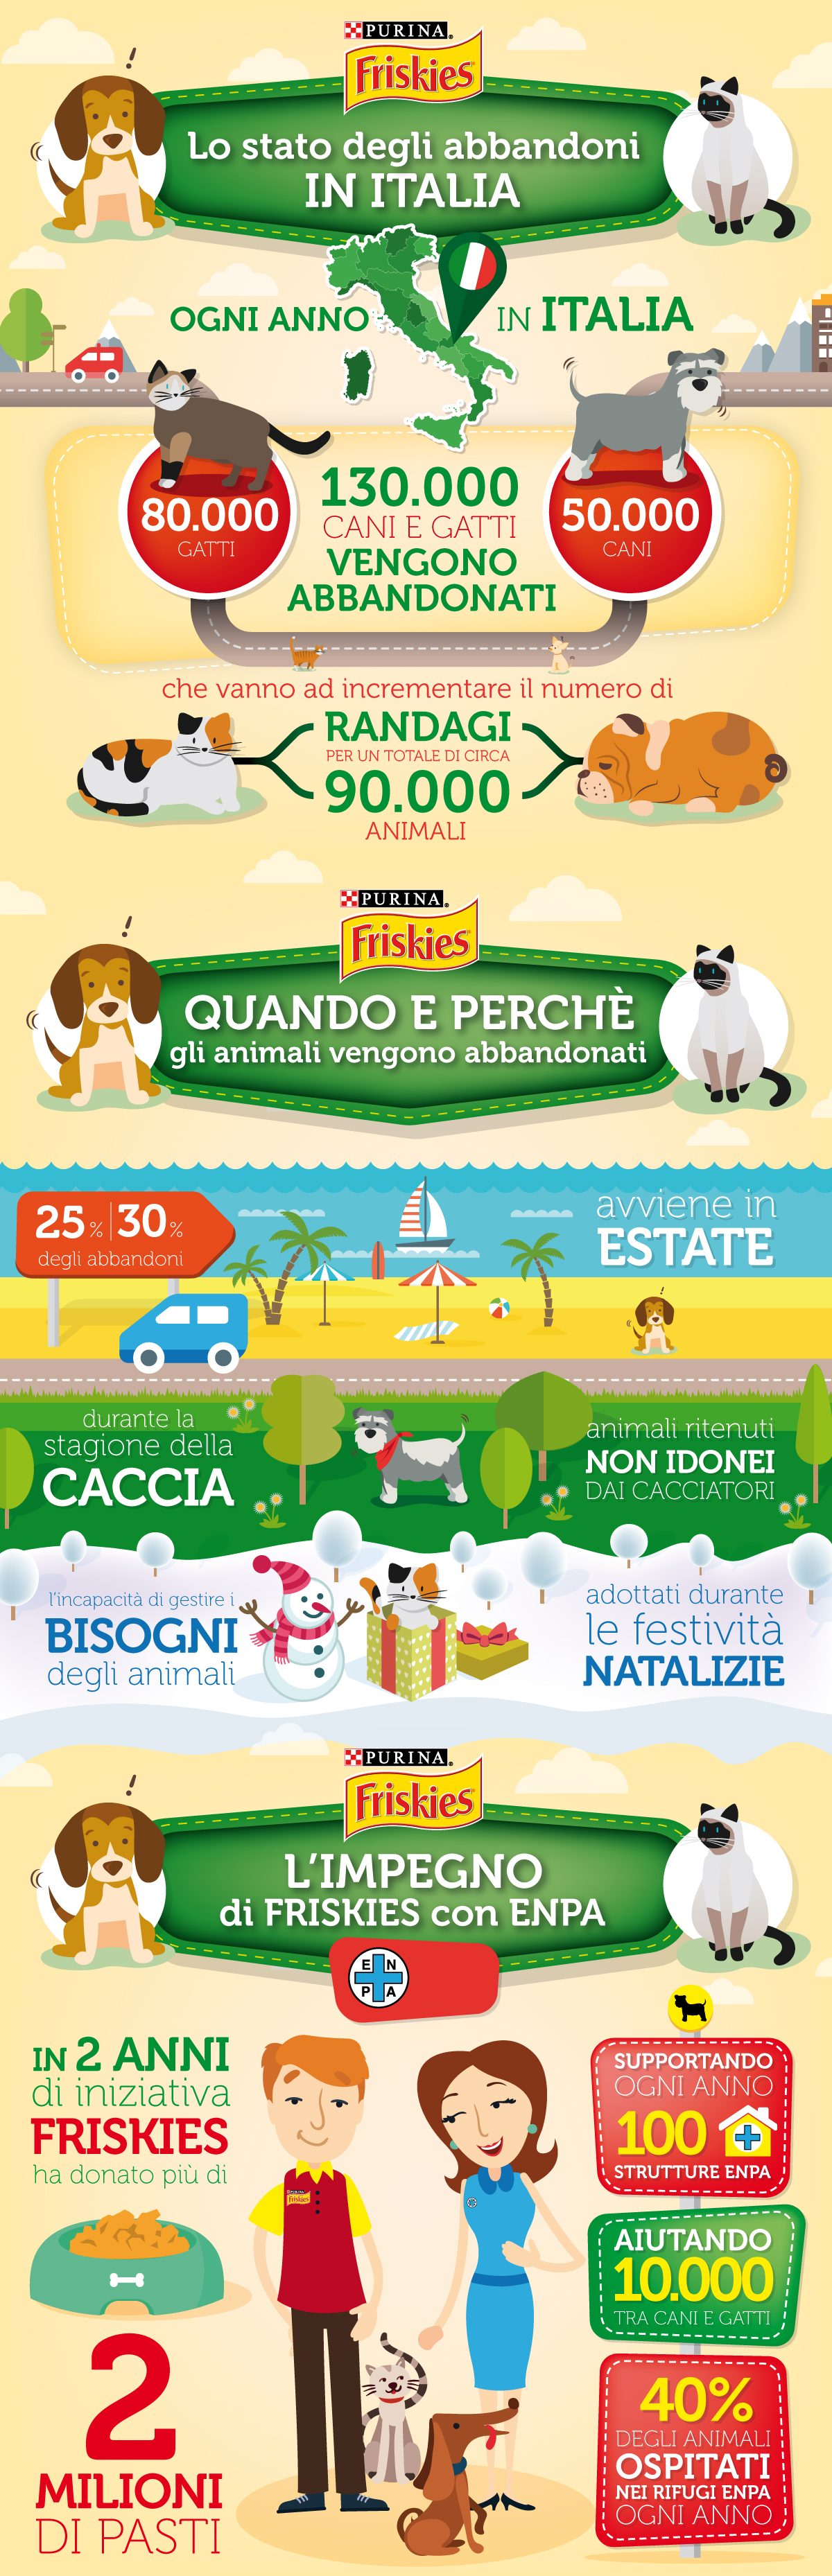 infografica_friskies_inseparabili